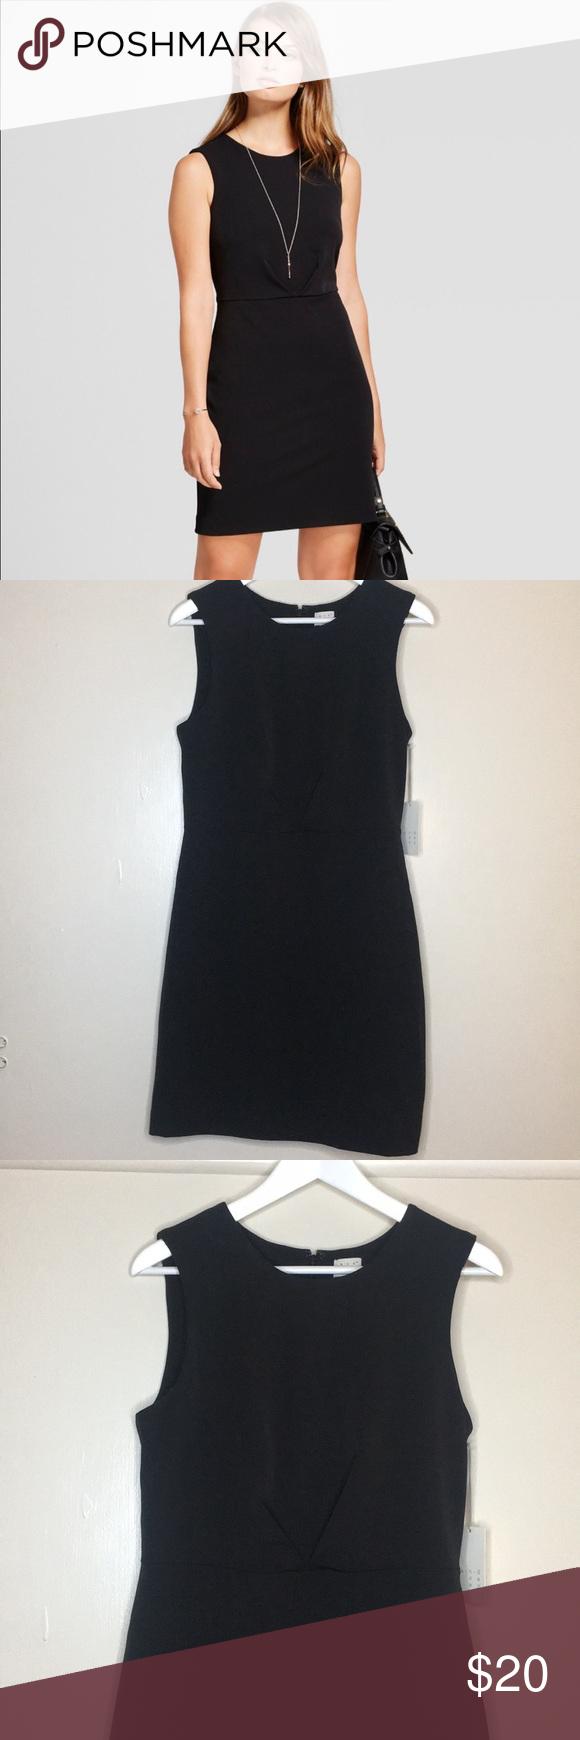 Nwt Target A New Day Little Black Dress Little Black Dress Black Dress Clothes Design [ 1740 x 580 Pixel ]